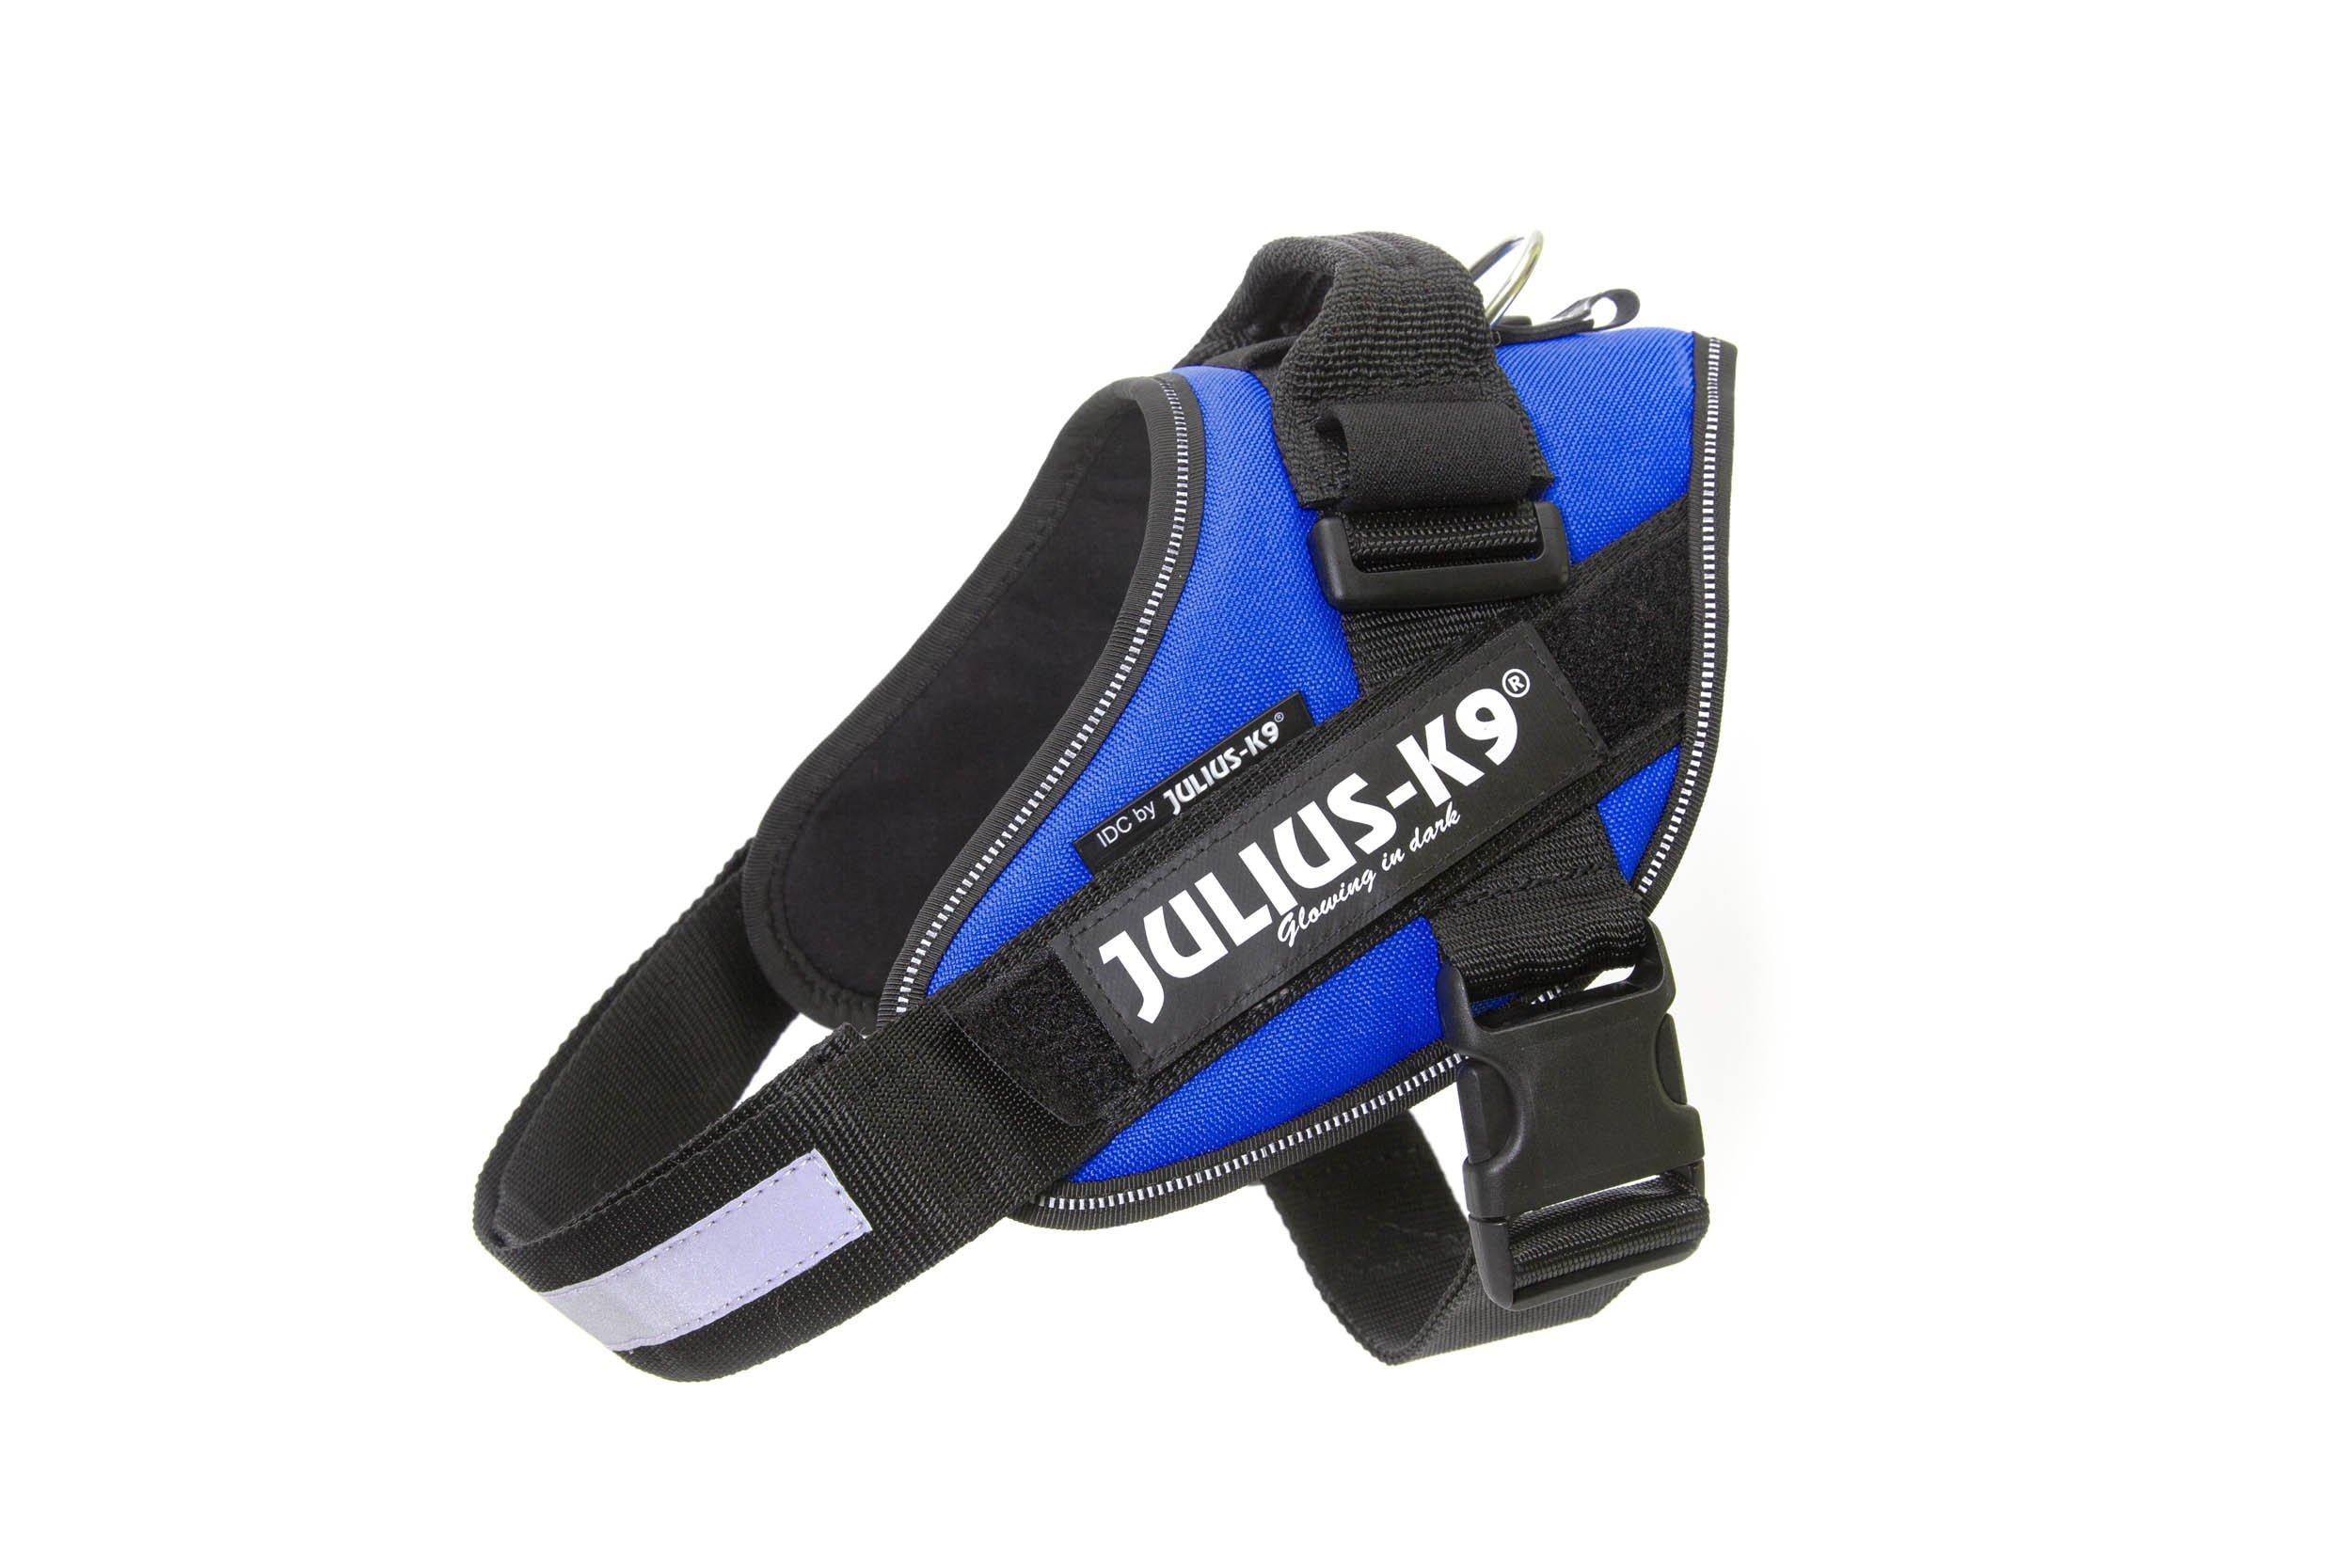 Julius-K9 16IDC-B-1 IDC Power Harness, Size: 1 (63-85cm/26-33.5''), Blue